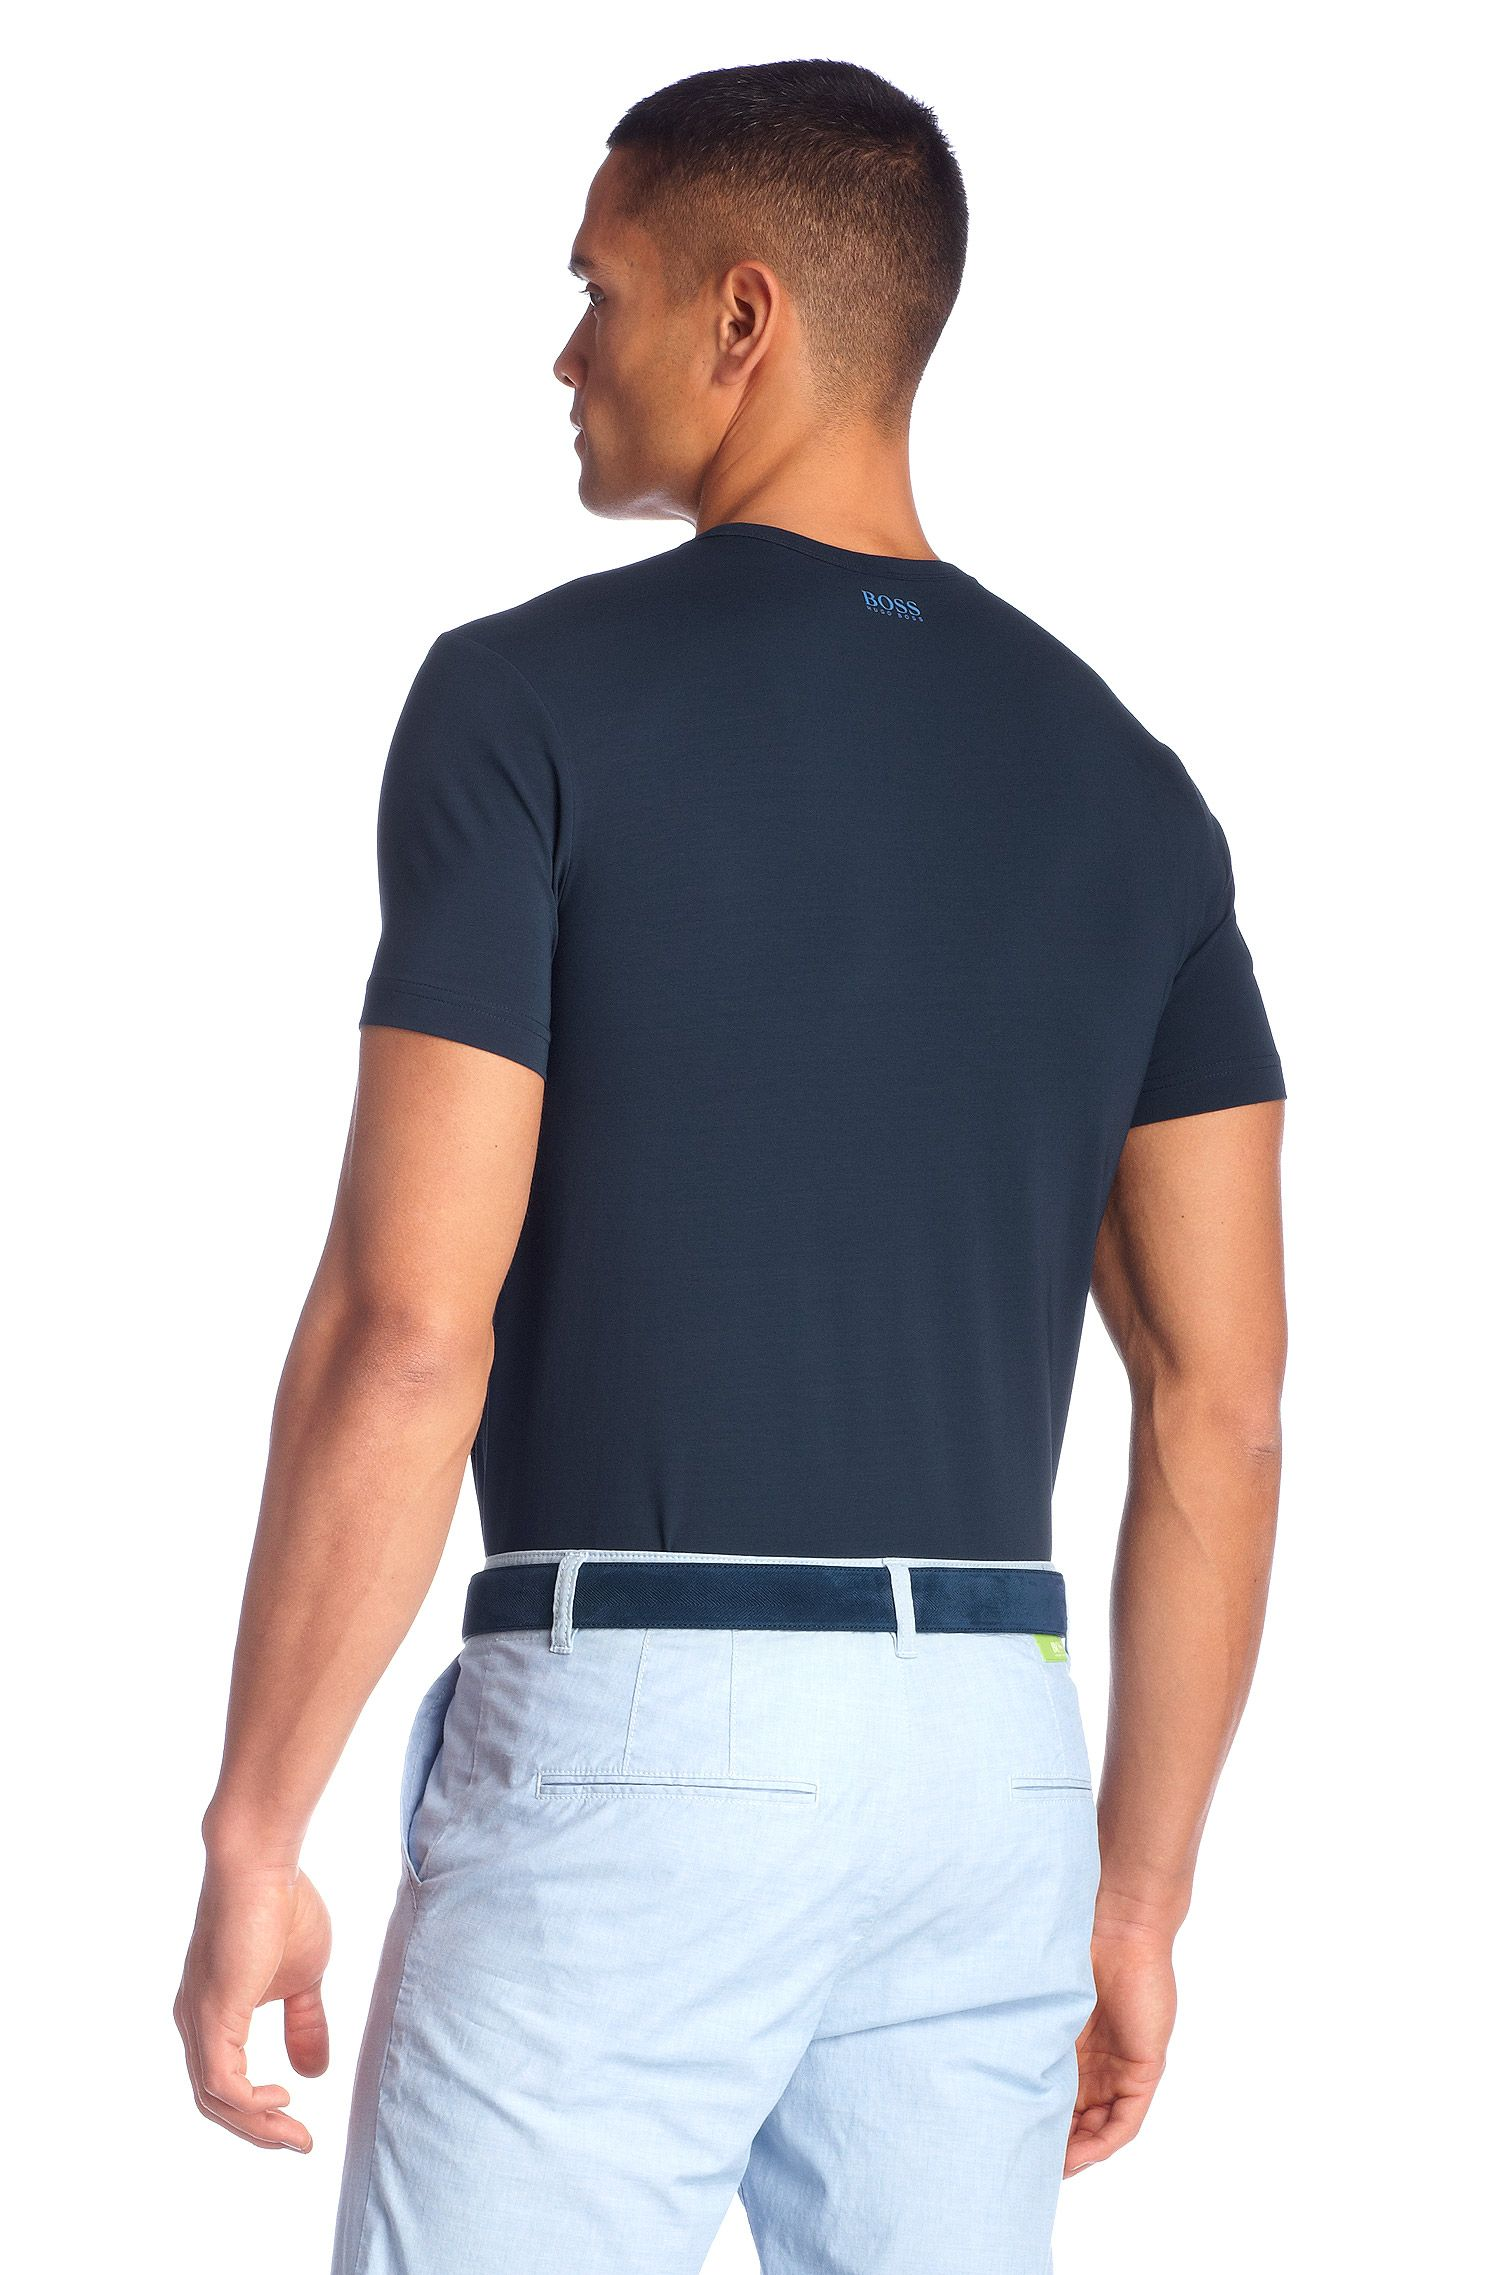 T-shirt à encolure ronde, Tee Tech 2